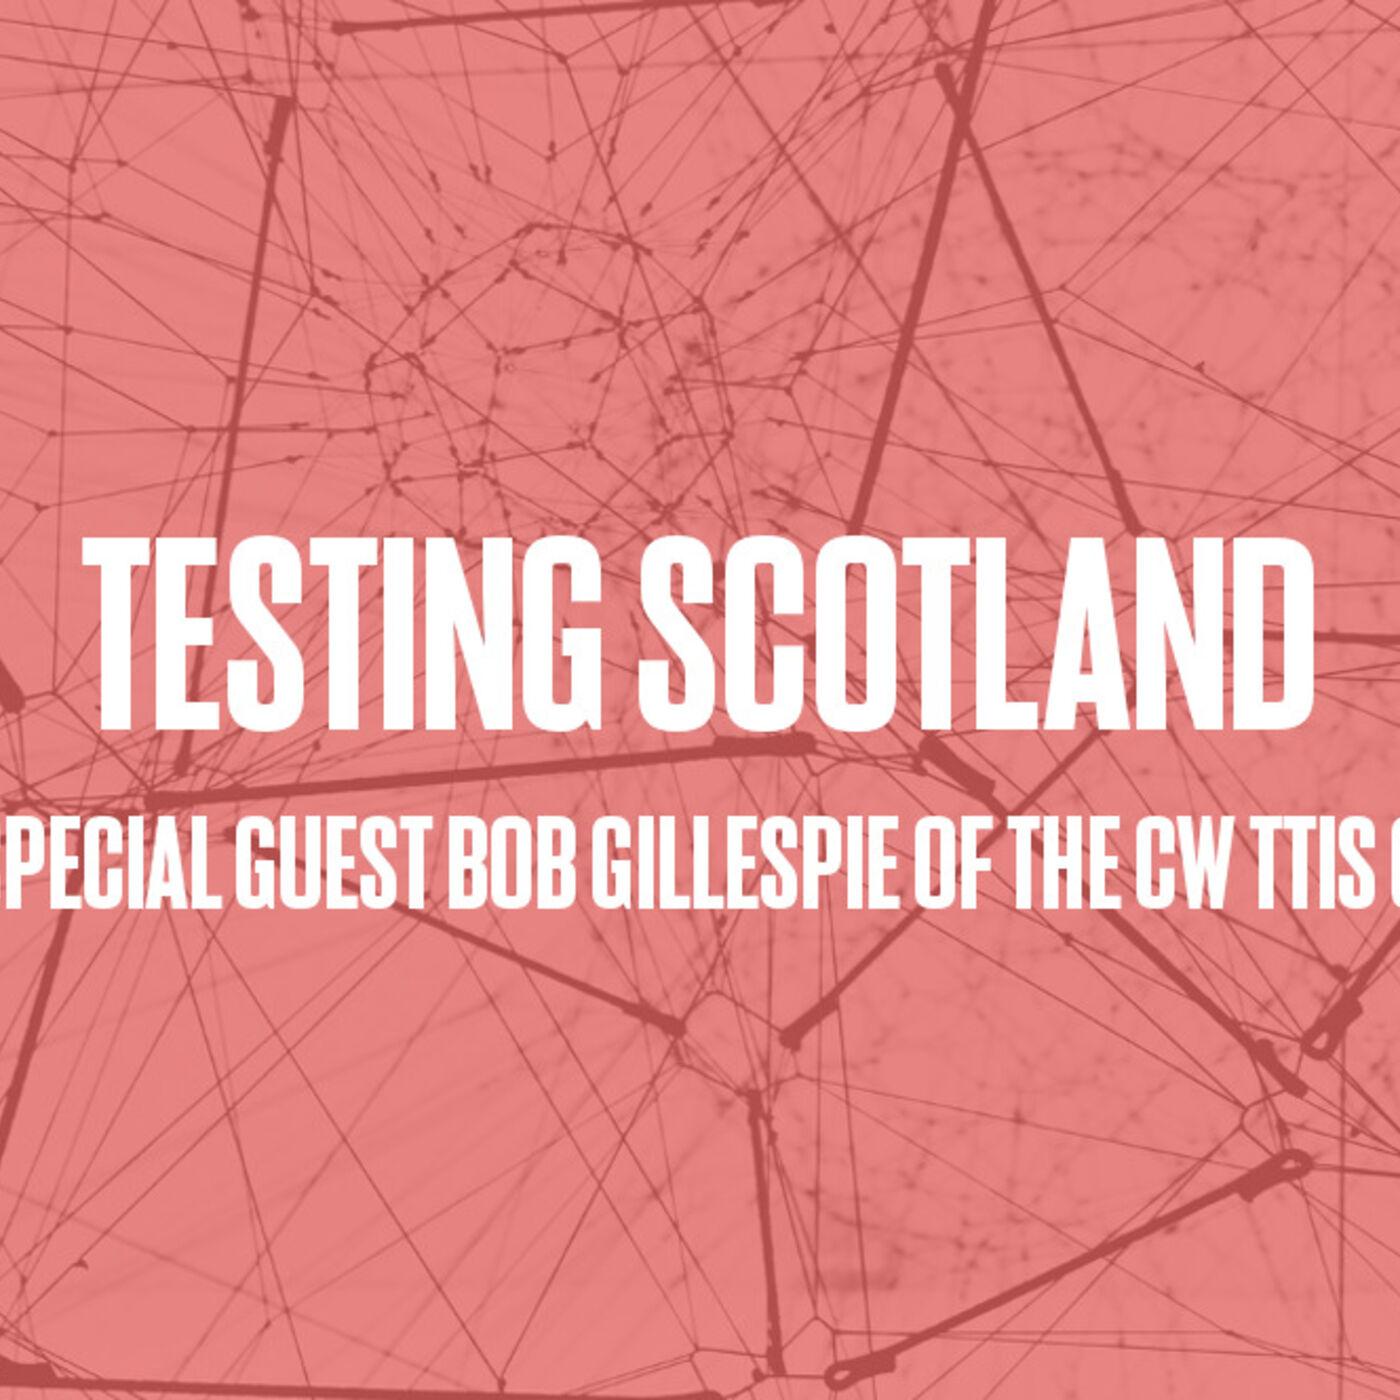 Episode #49 - Testing Scotland